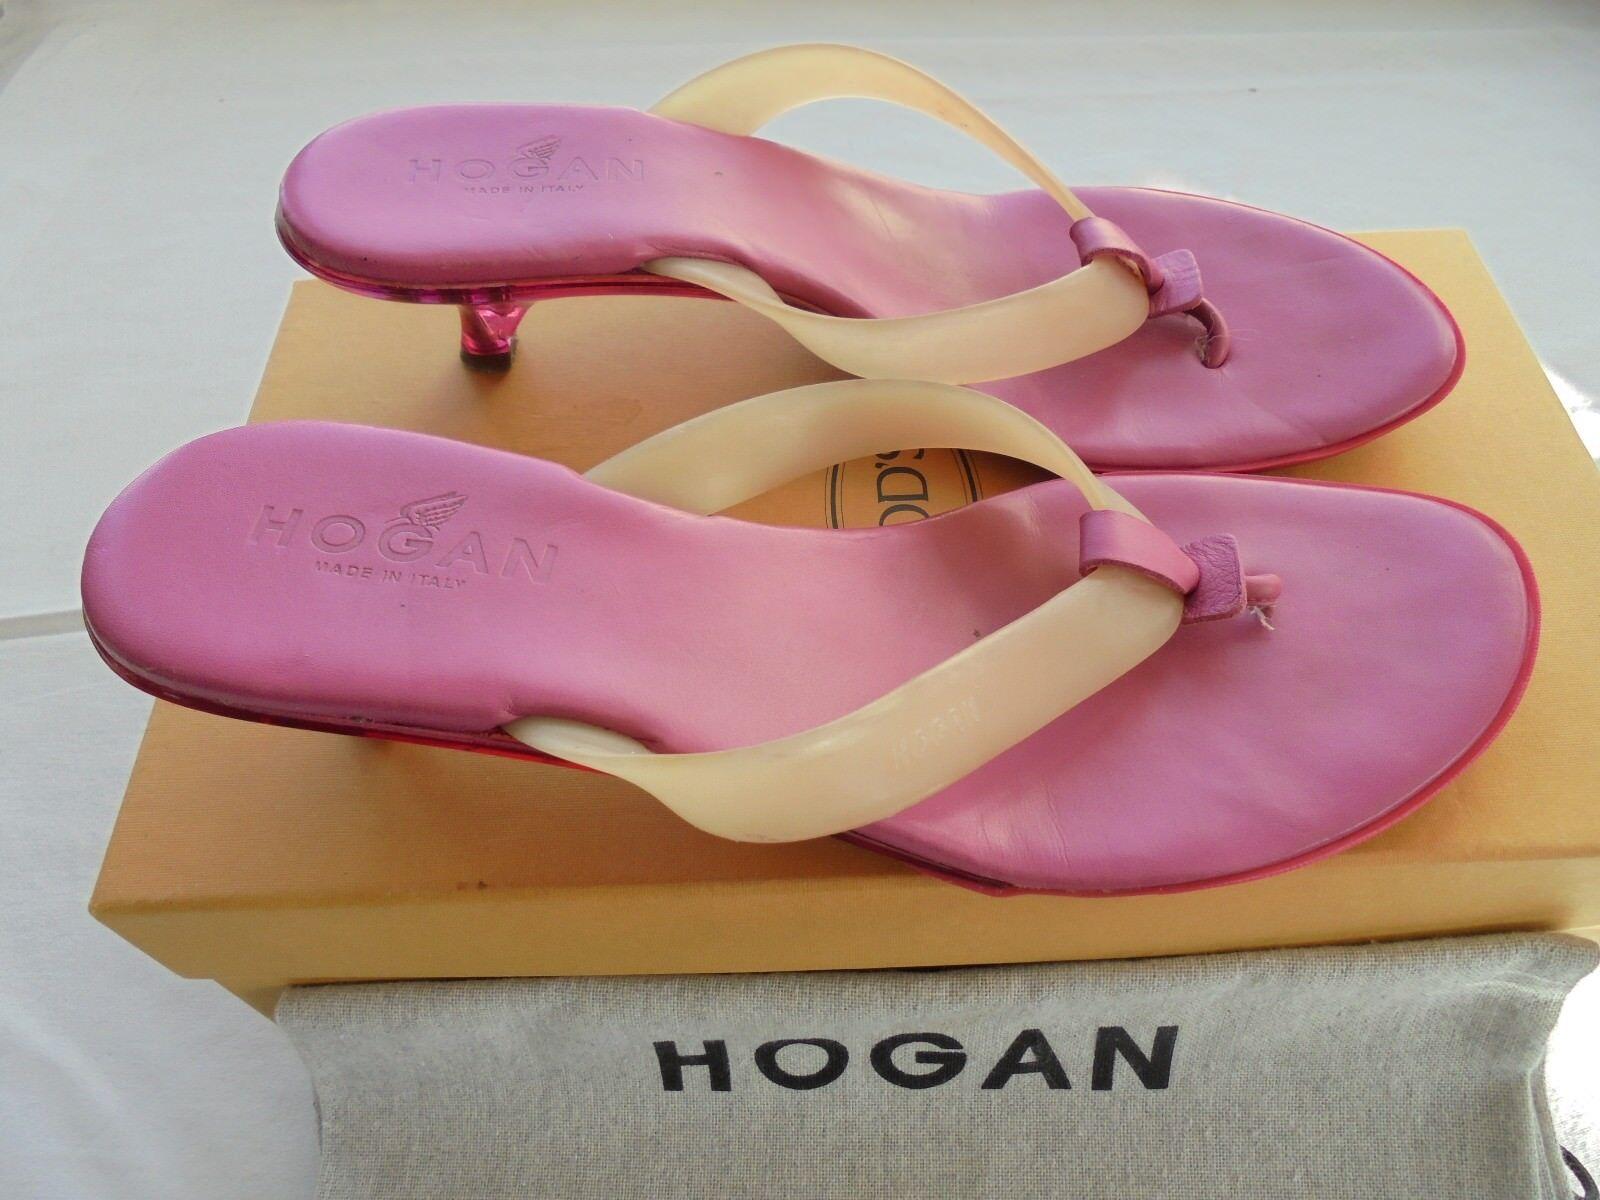 Original Hogan by by by Tod's Sandalen NP:  TOP Tasche Pumps Sandaletten Gr. 38 b18fb9